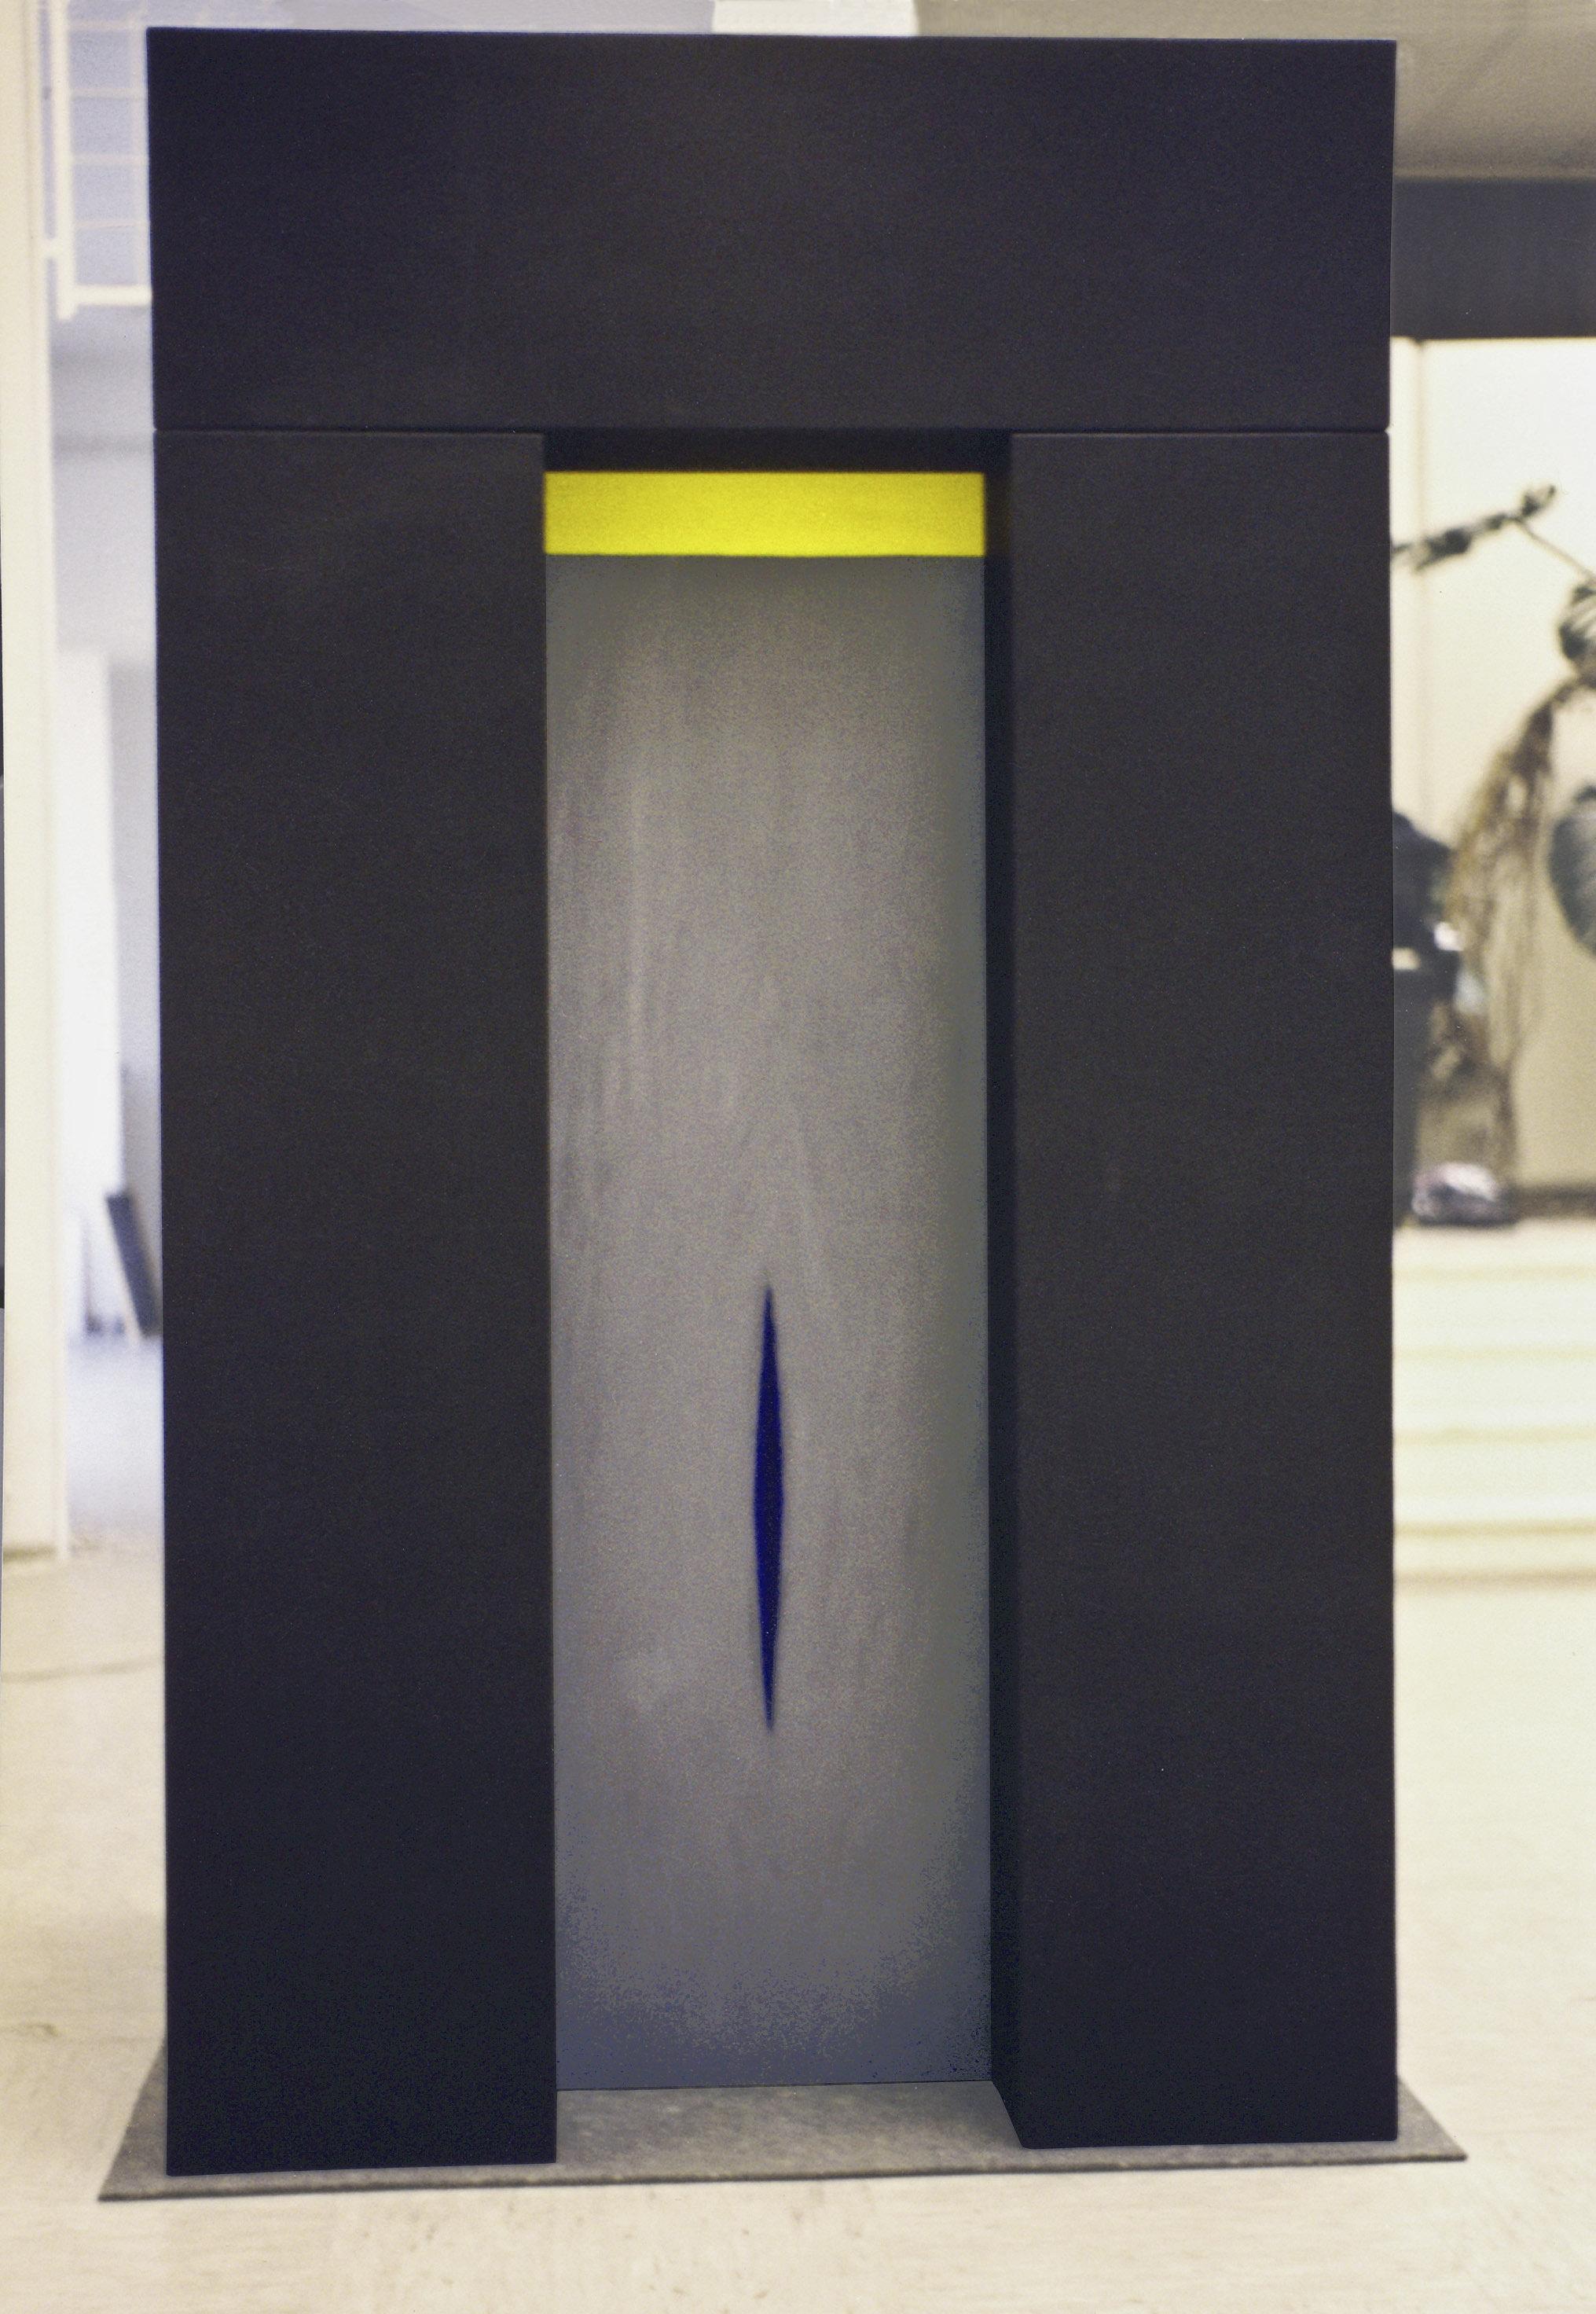 akril, les, 145 x145 x 245 cm, 1989